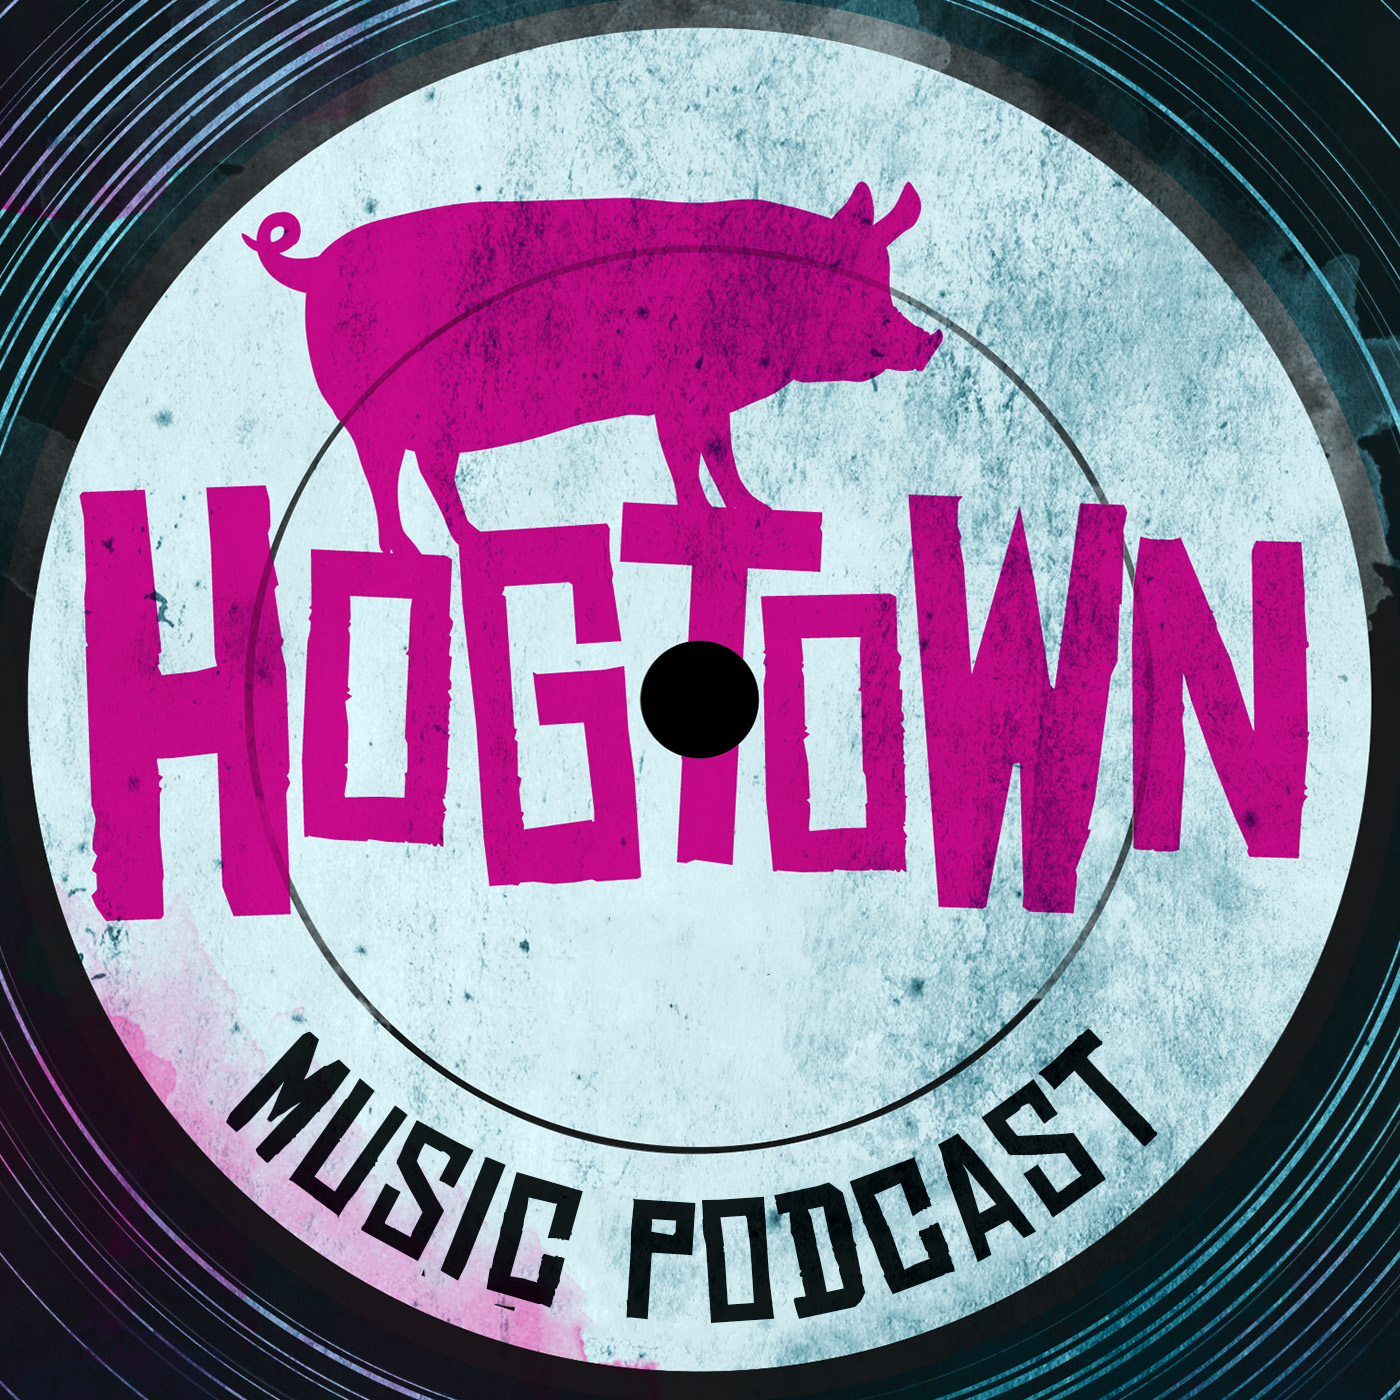 upd1_hogtown_podcast_1400px (1)